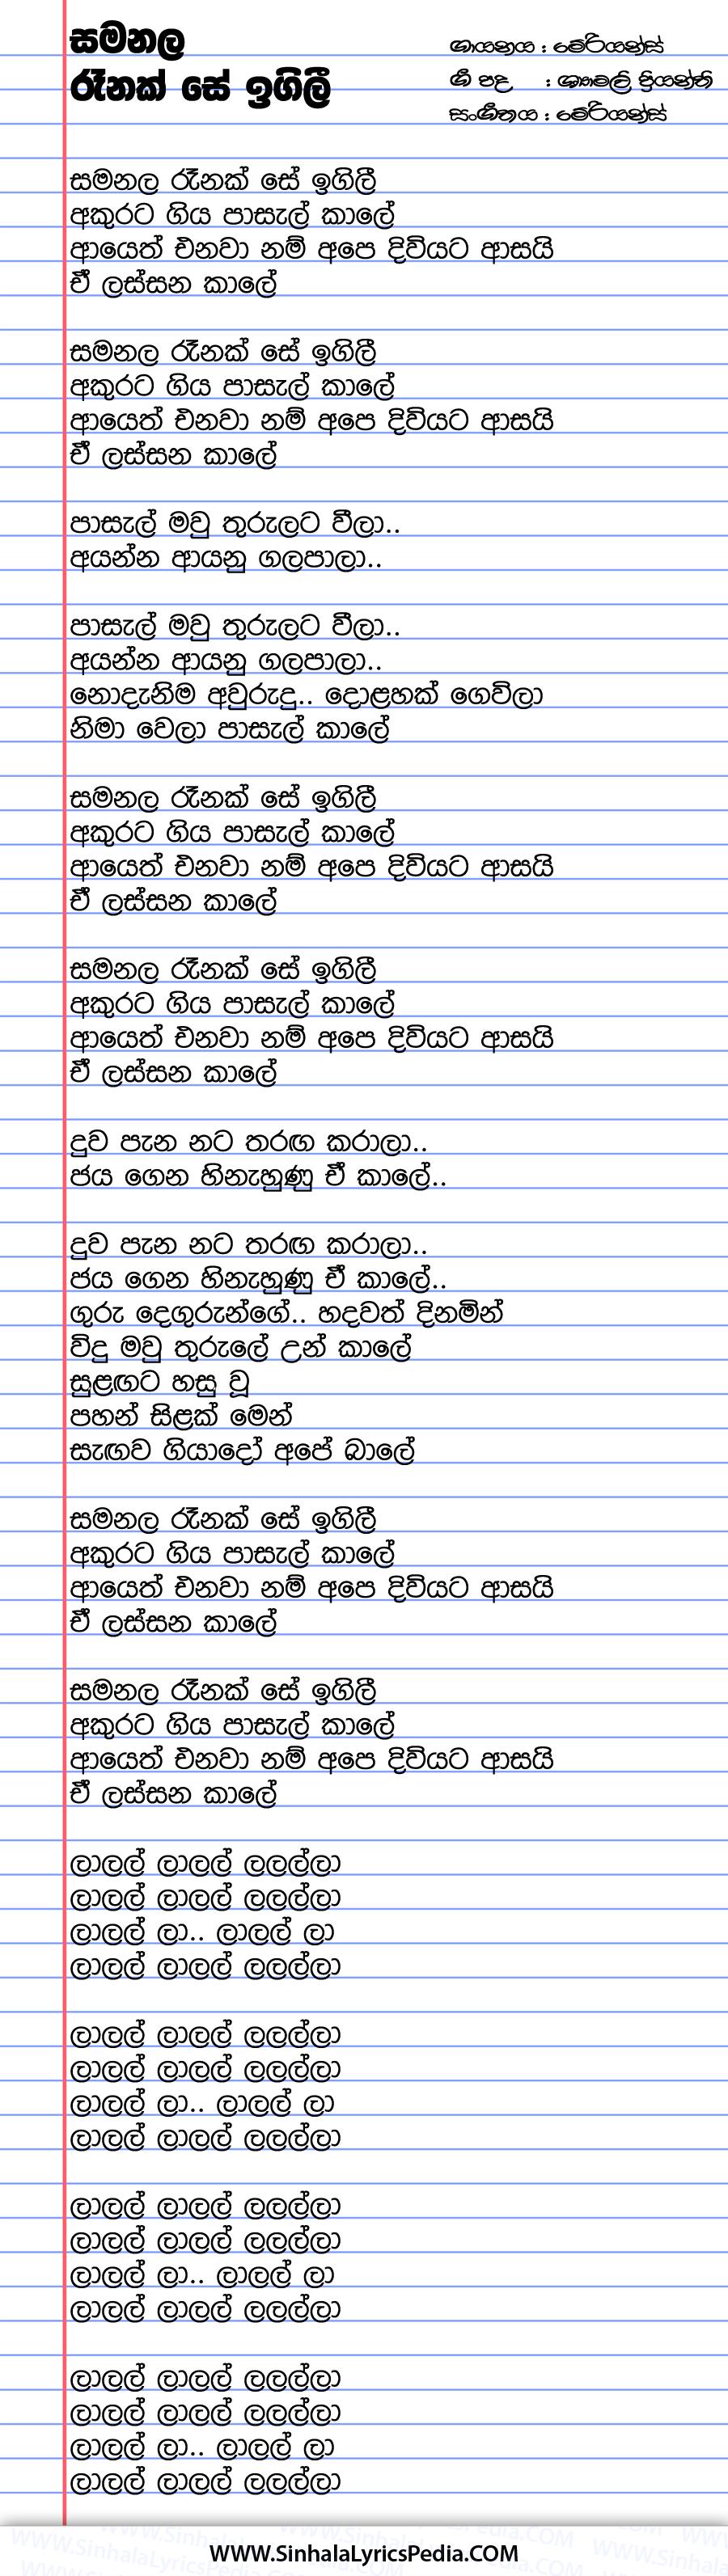 Samanala Ranak Se Igili Song Lyrics